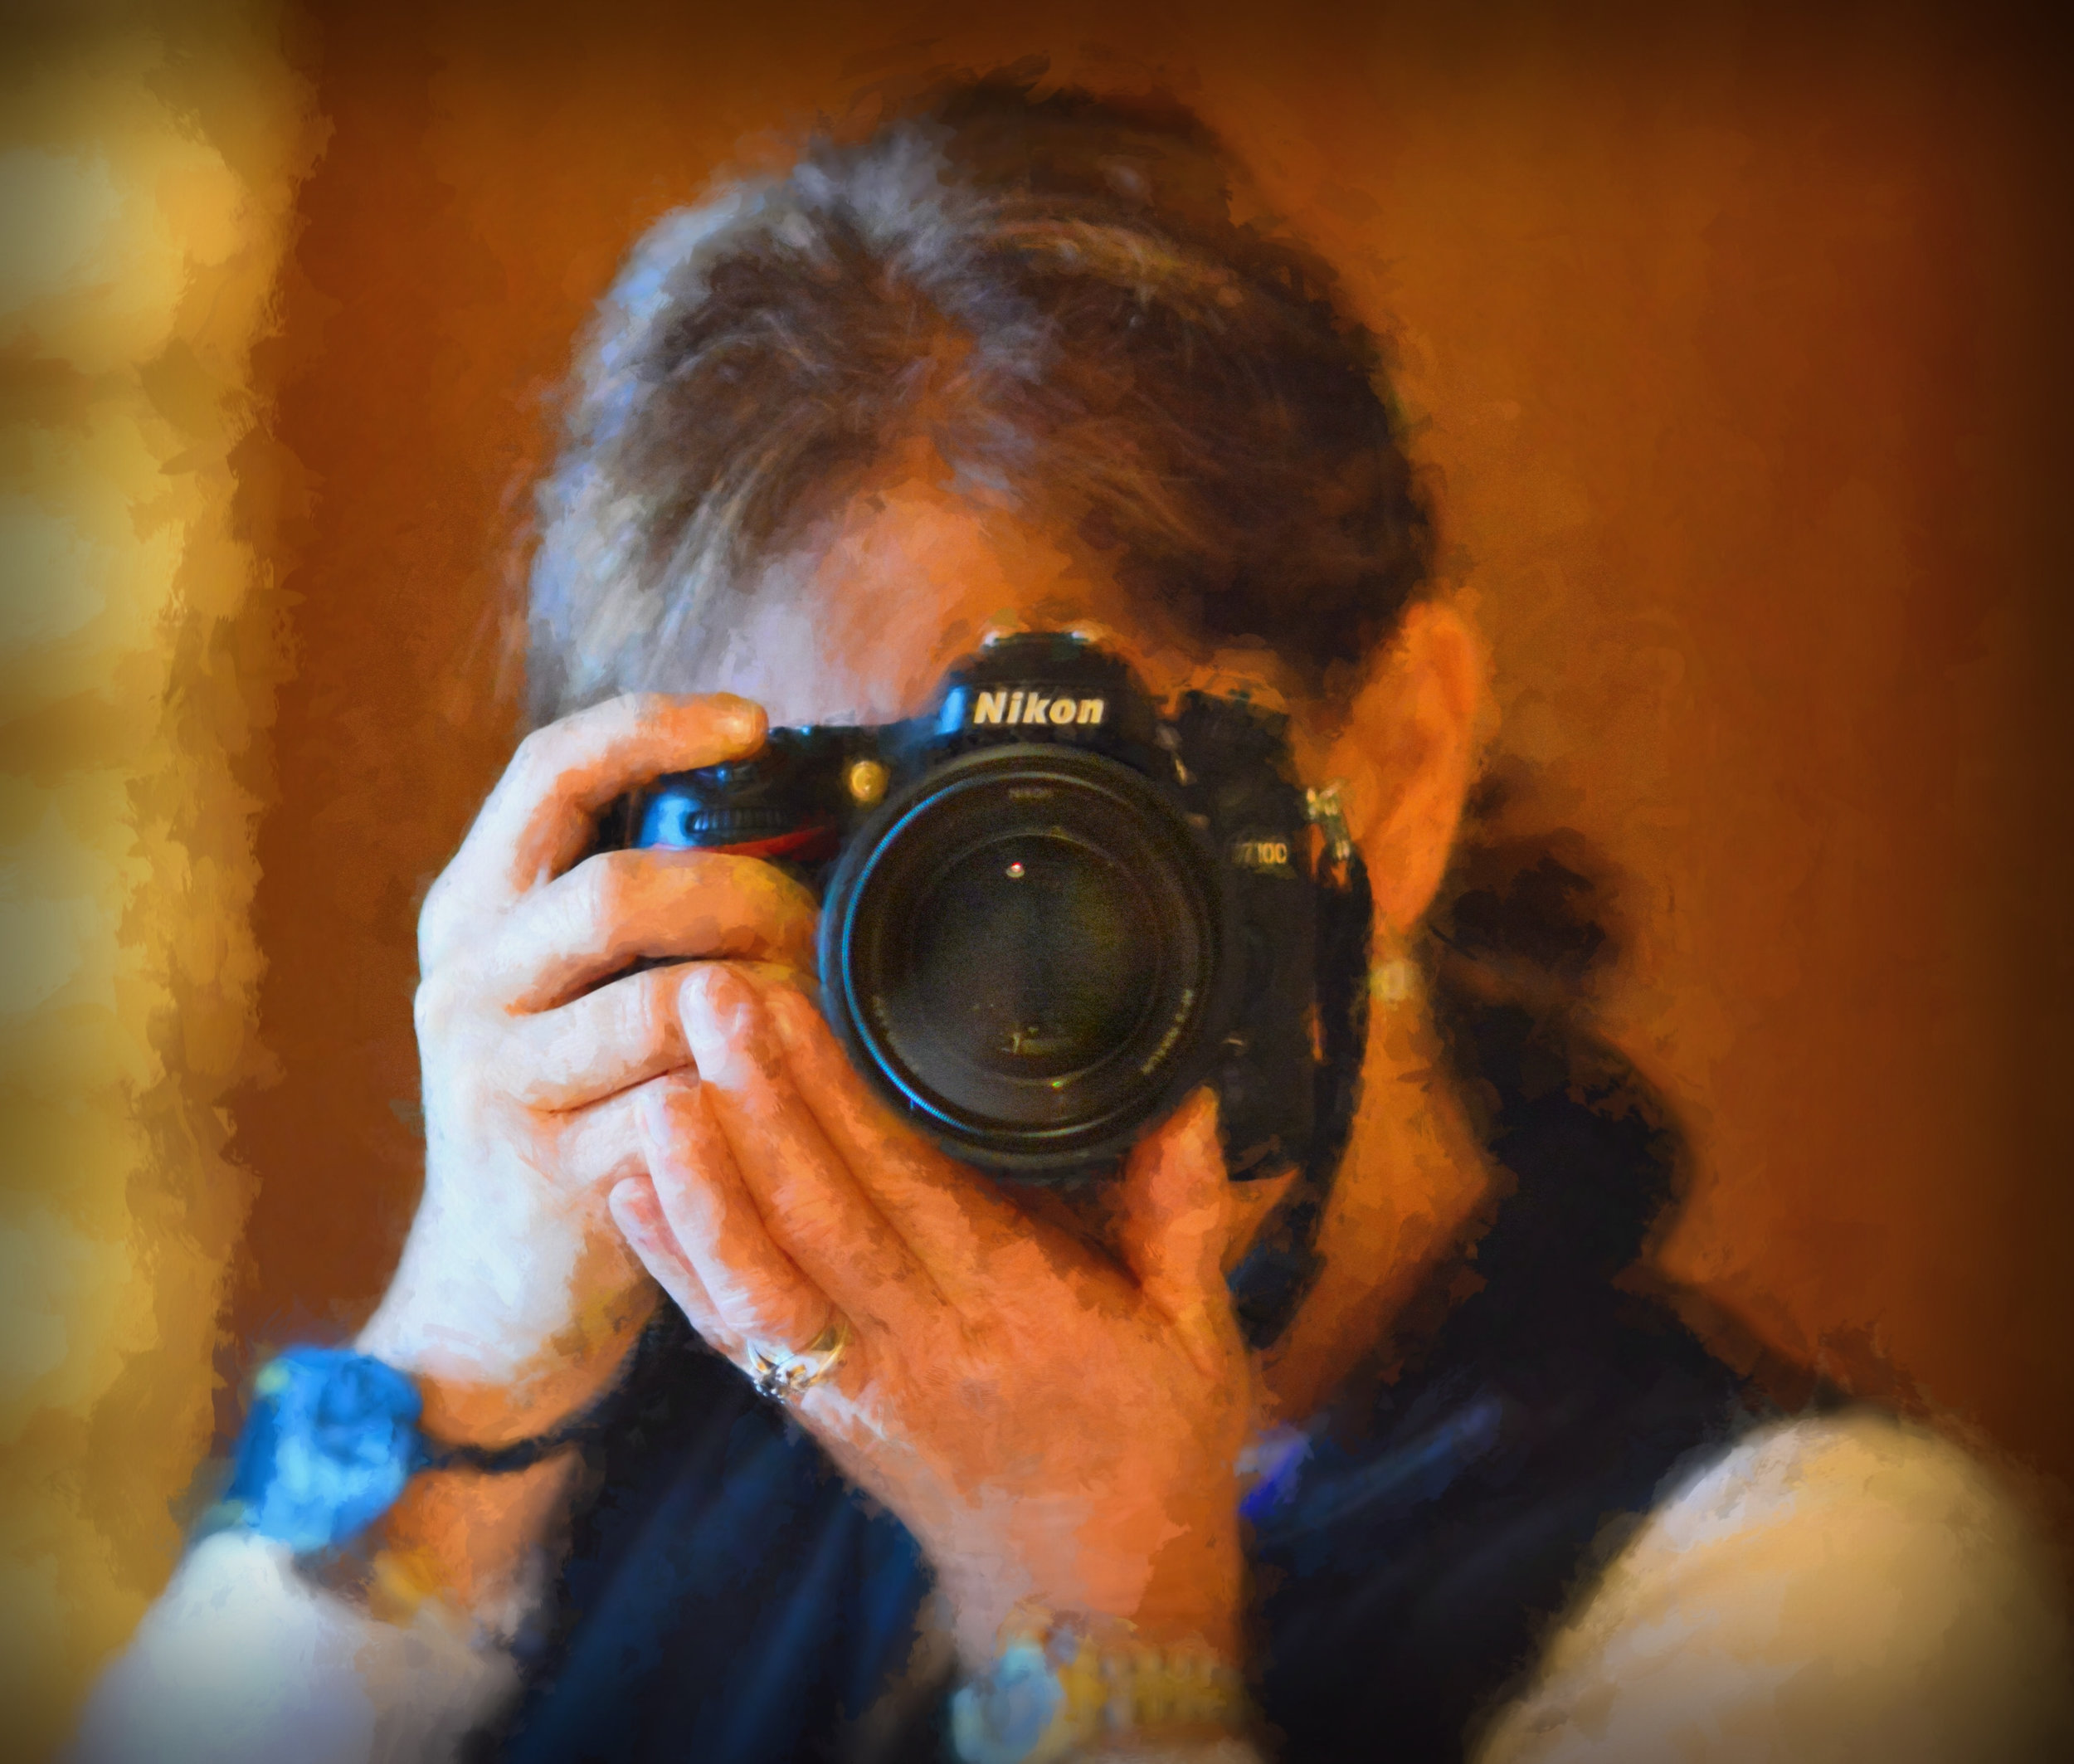 I love my Nikons! :)